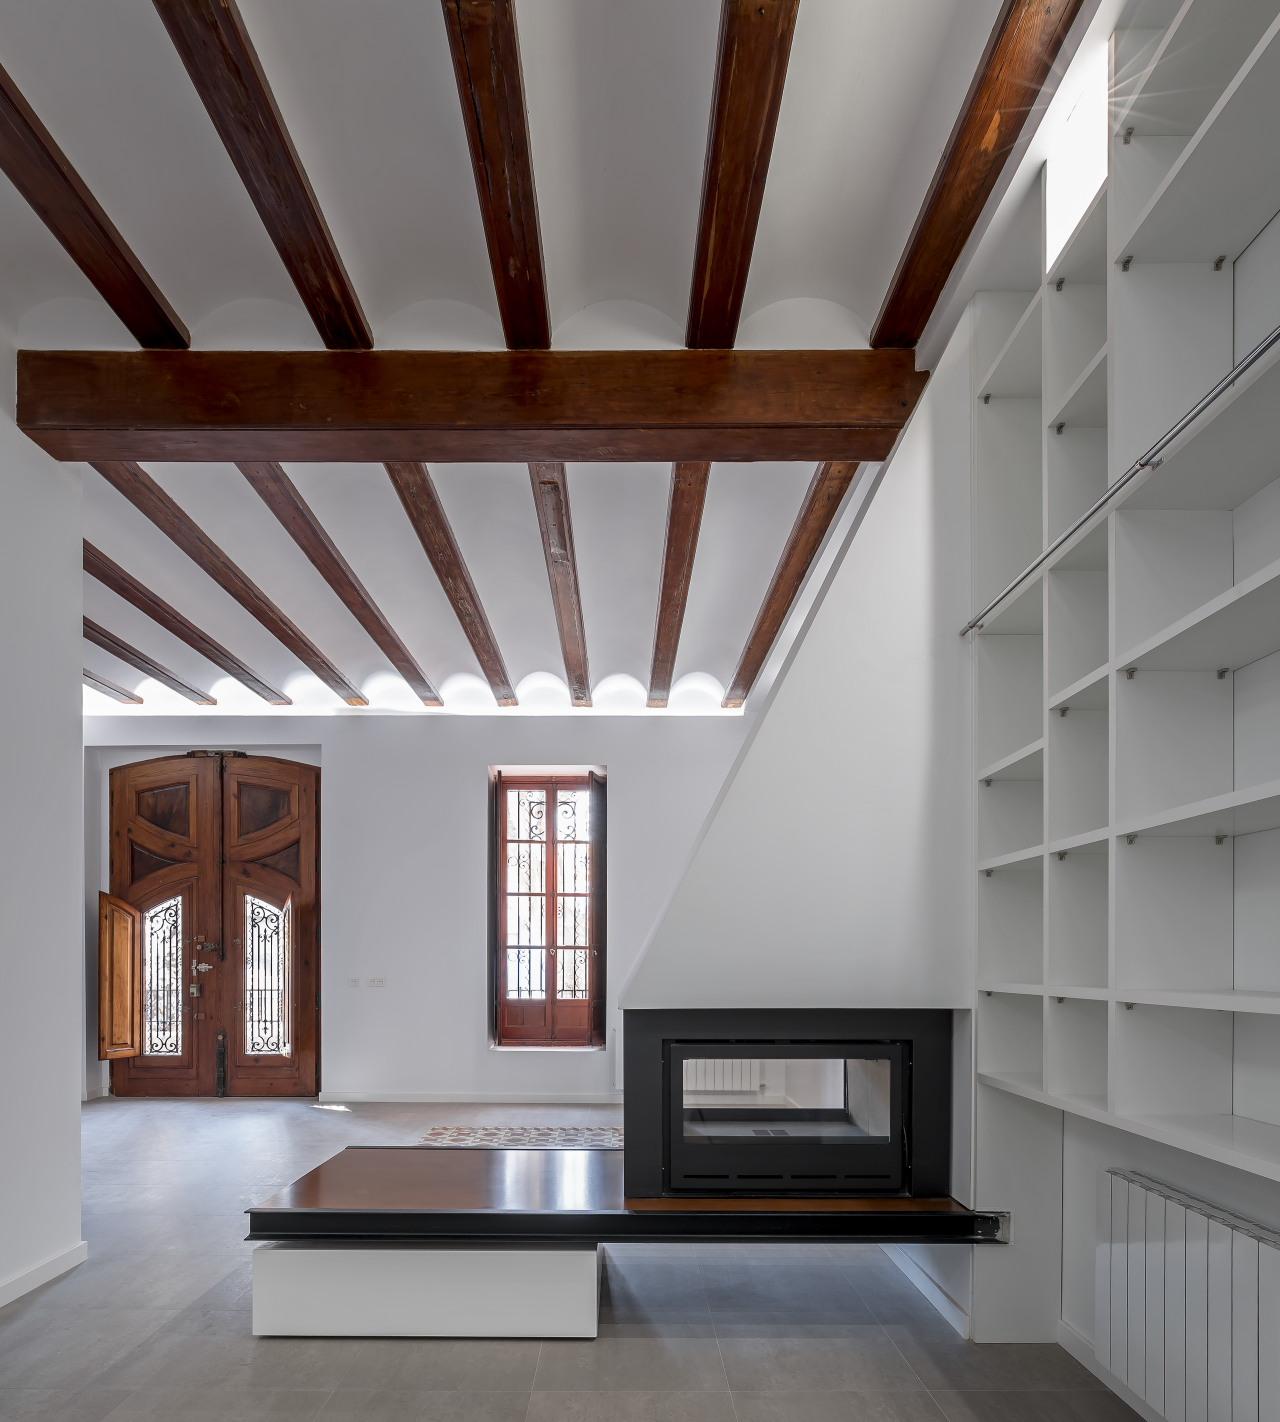 fotografia-arquitectura-valencia-german-cabo-viraje-rehabilitacion-campanar (4)